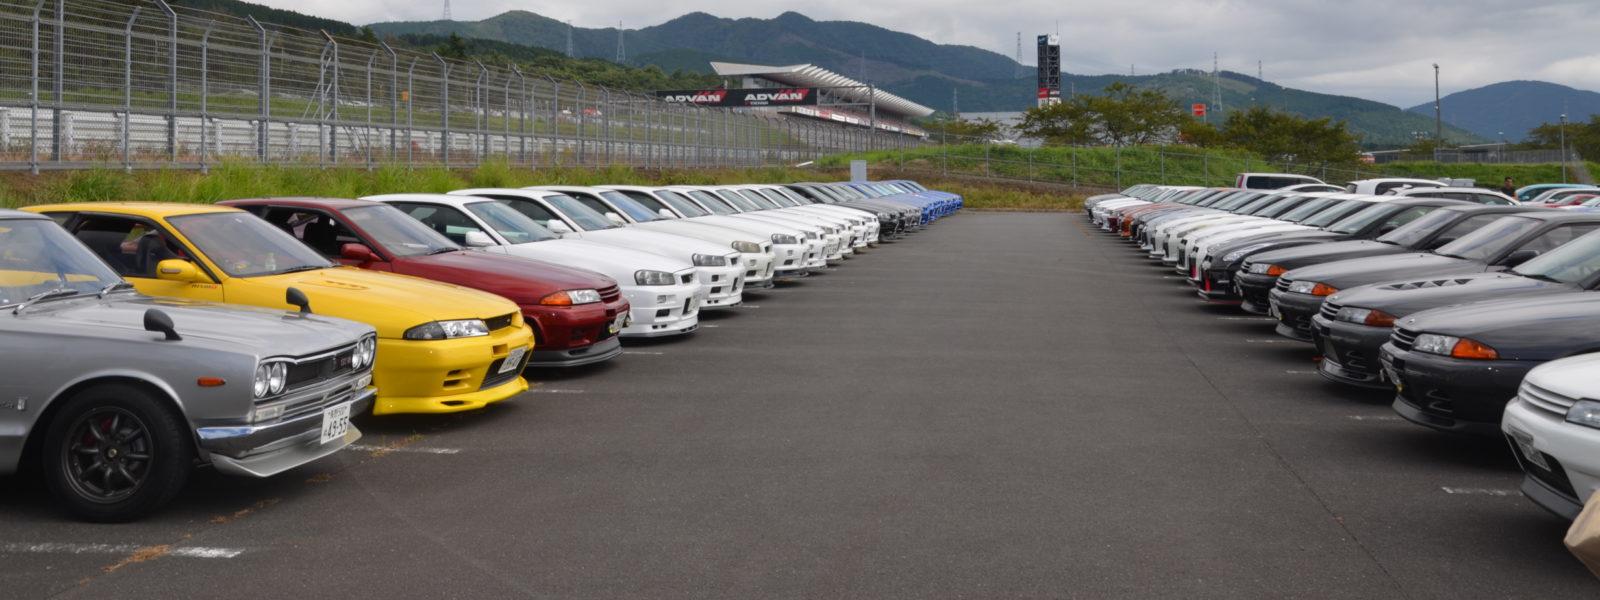 GT-R オーナーズミーティング&パレードラン in ツインリングもてぎ